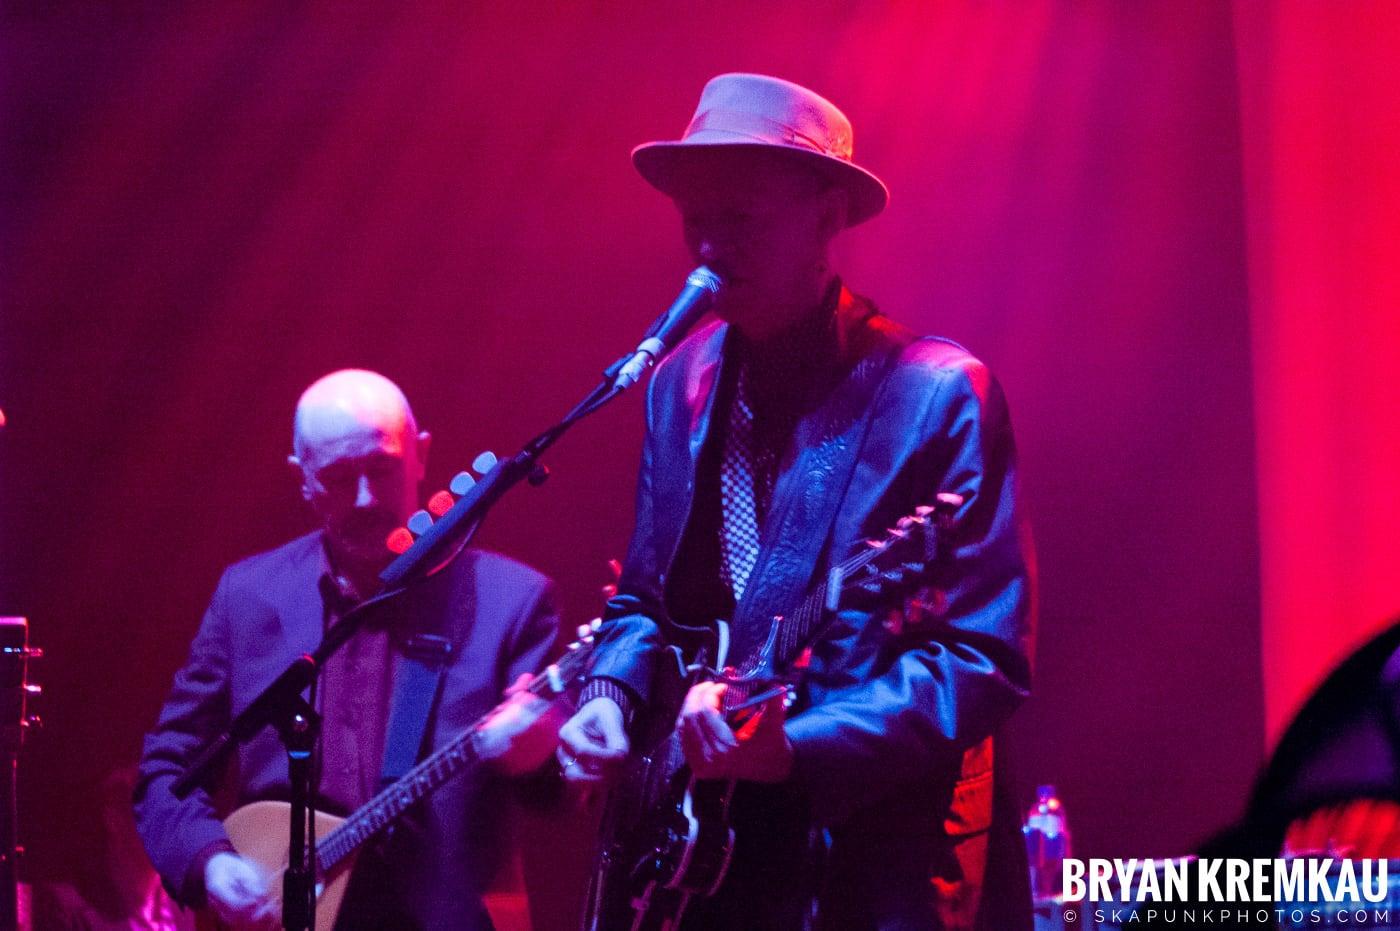 The Pogues @ Brixton Academy, London UK - 12.17.06 (6)